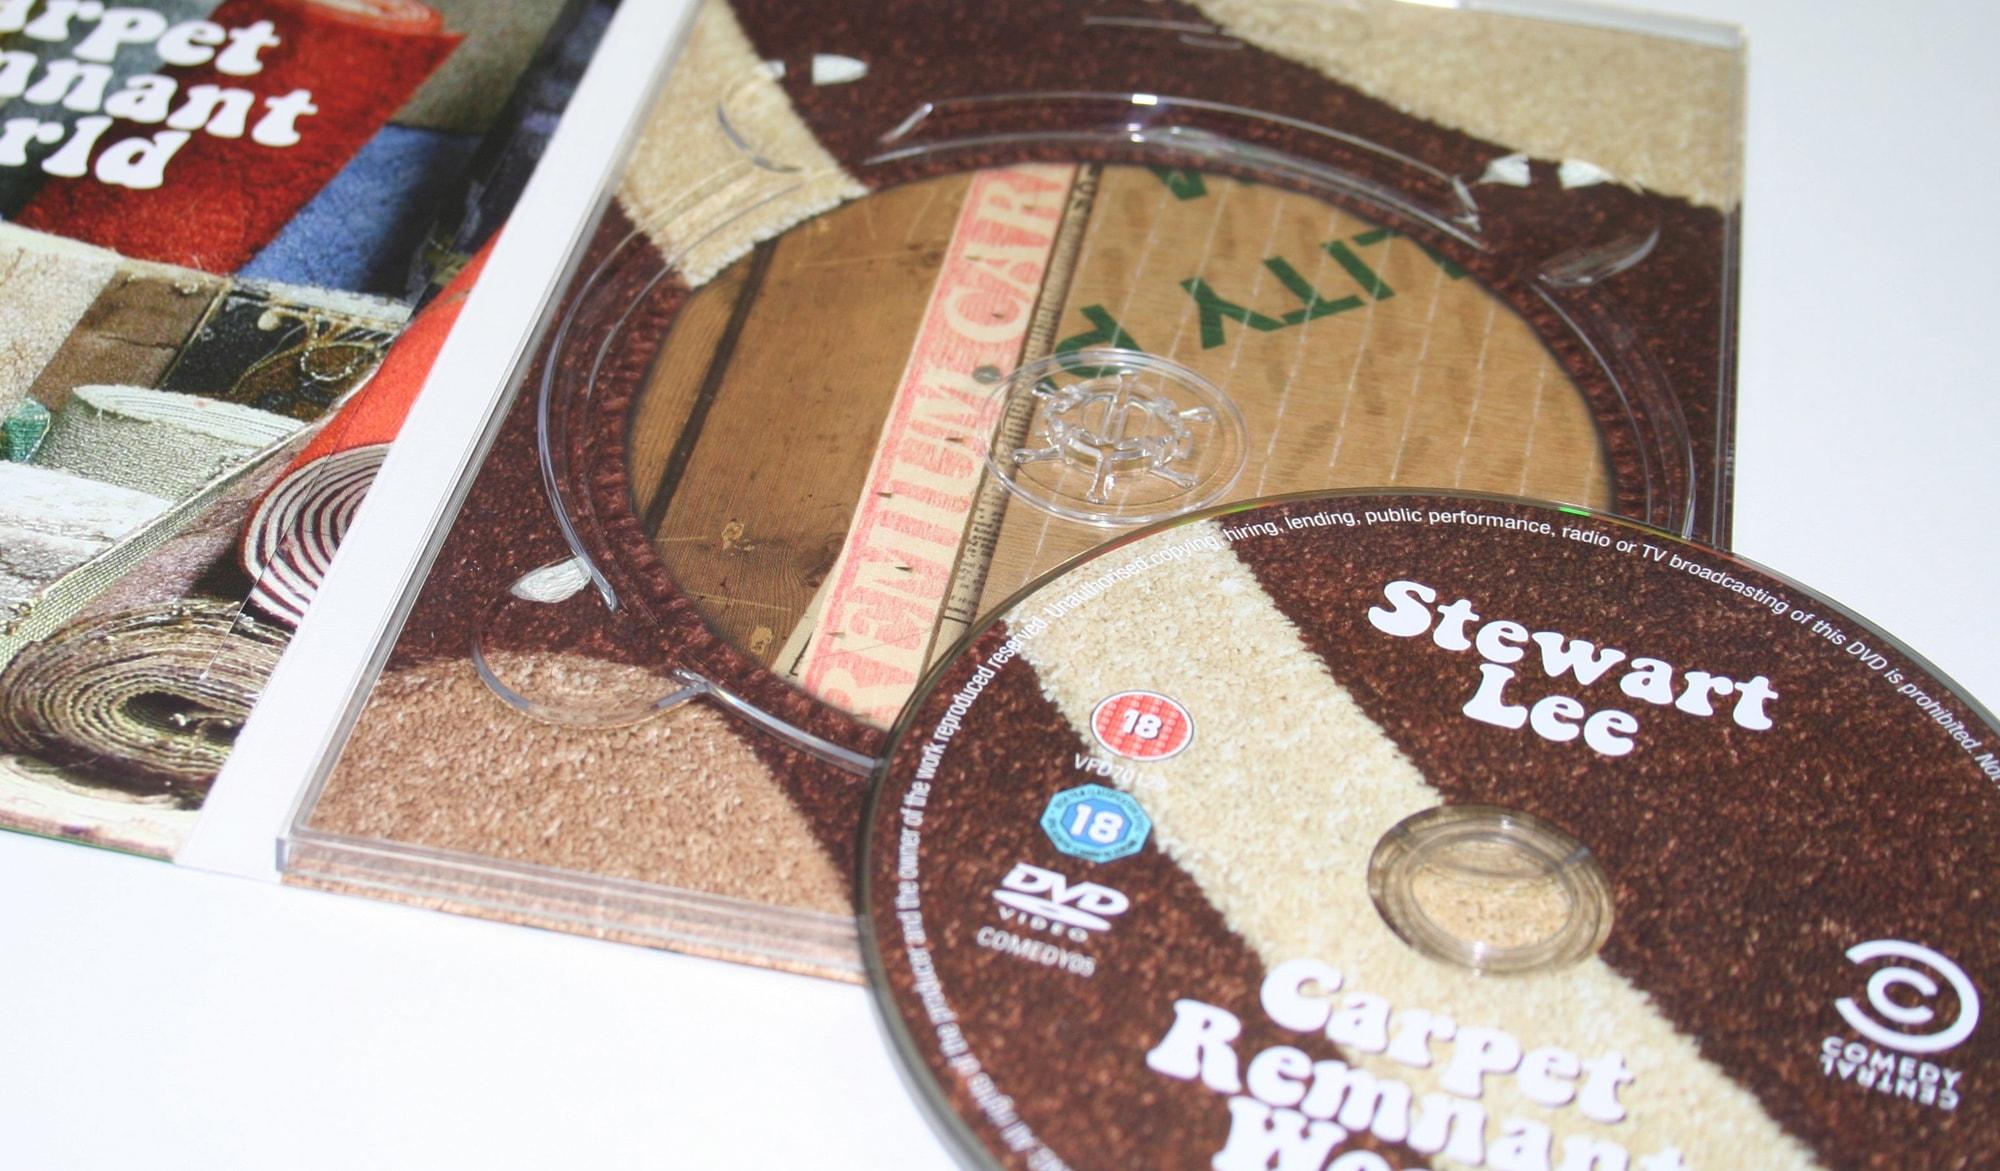 Stewart Lee - carpet world DVD - disc